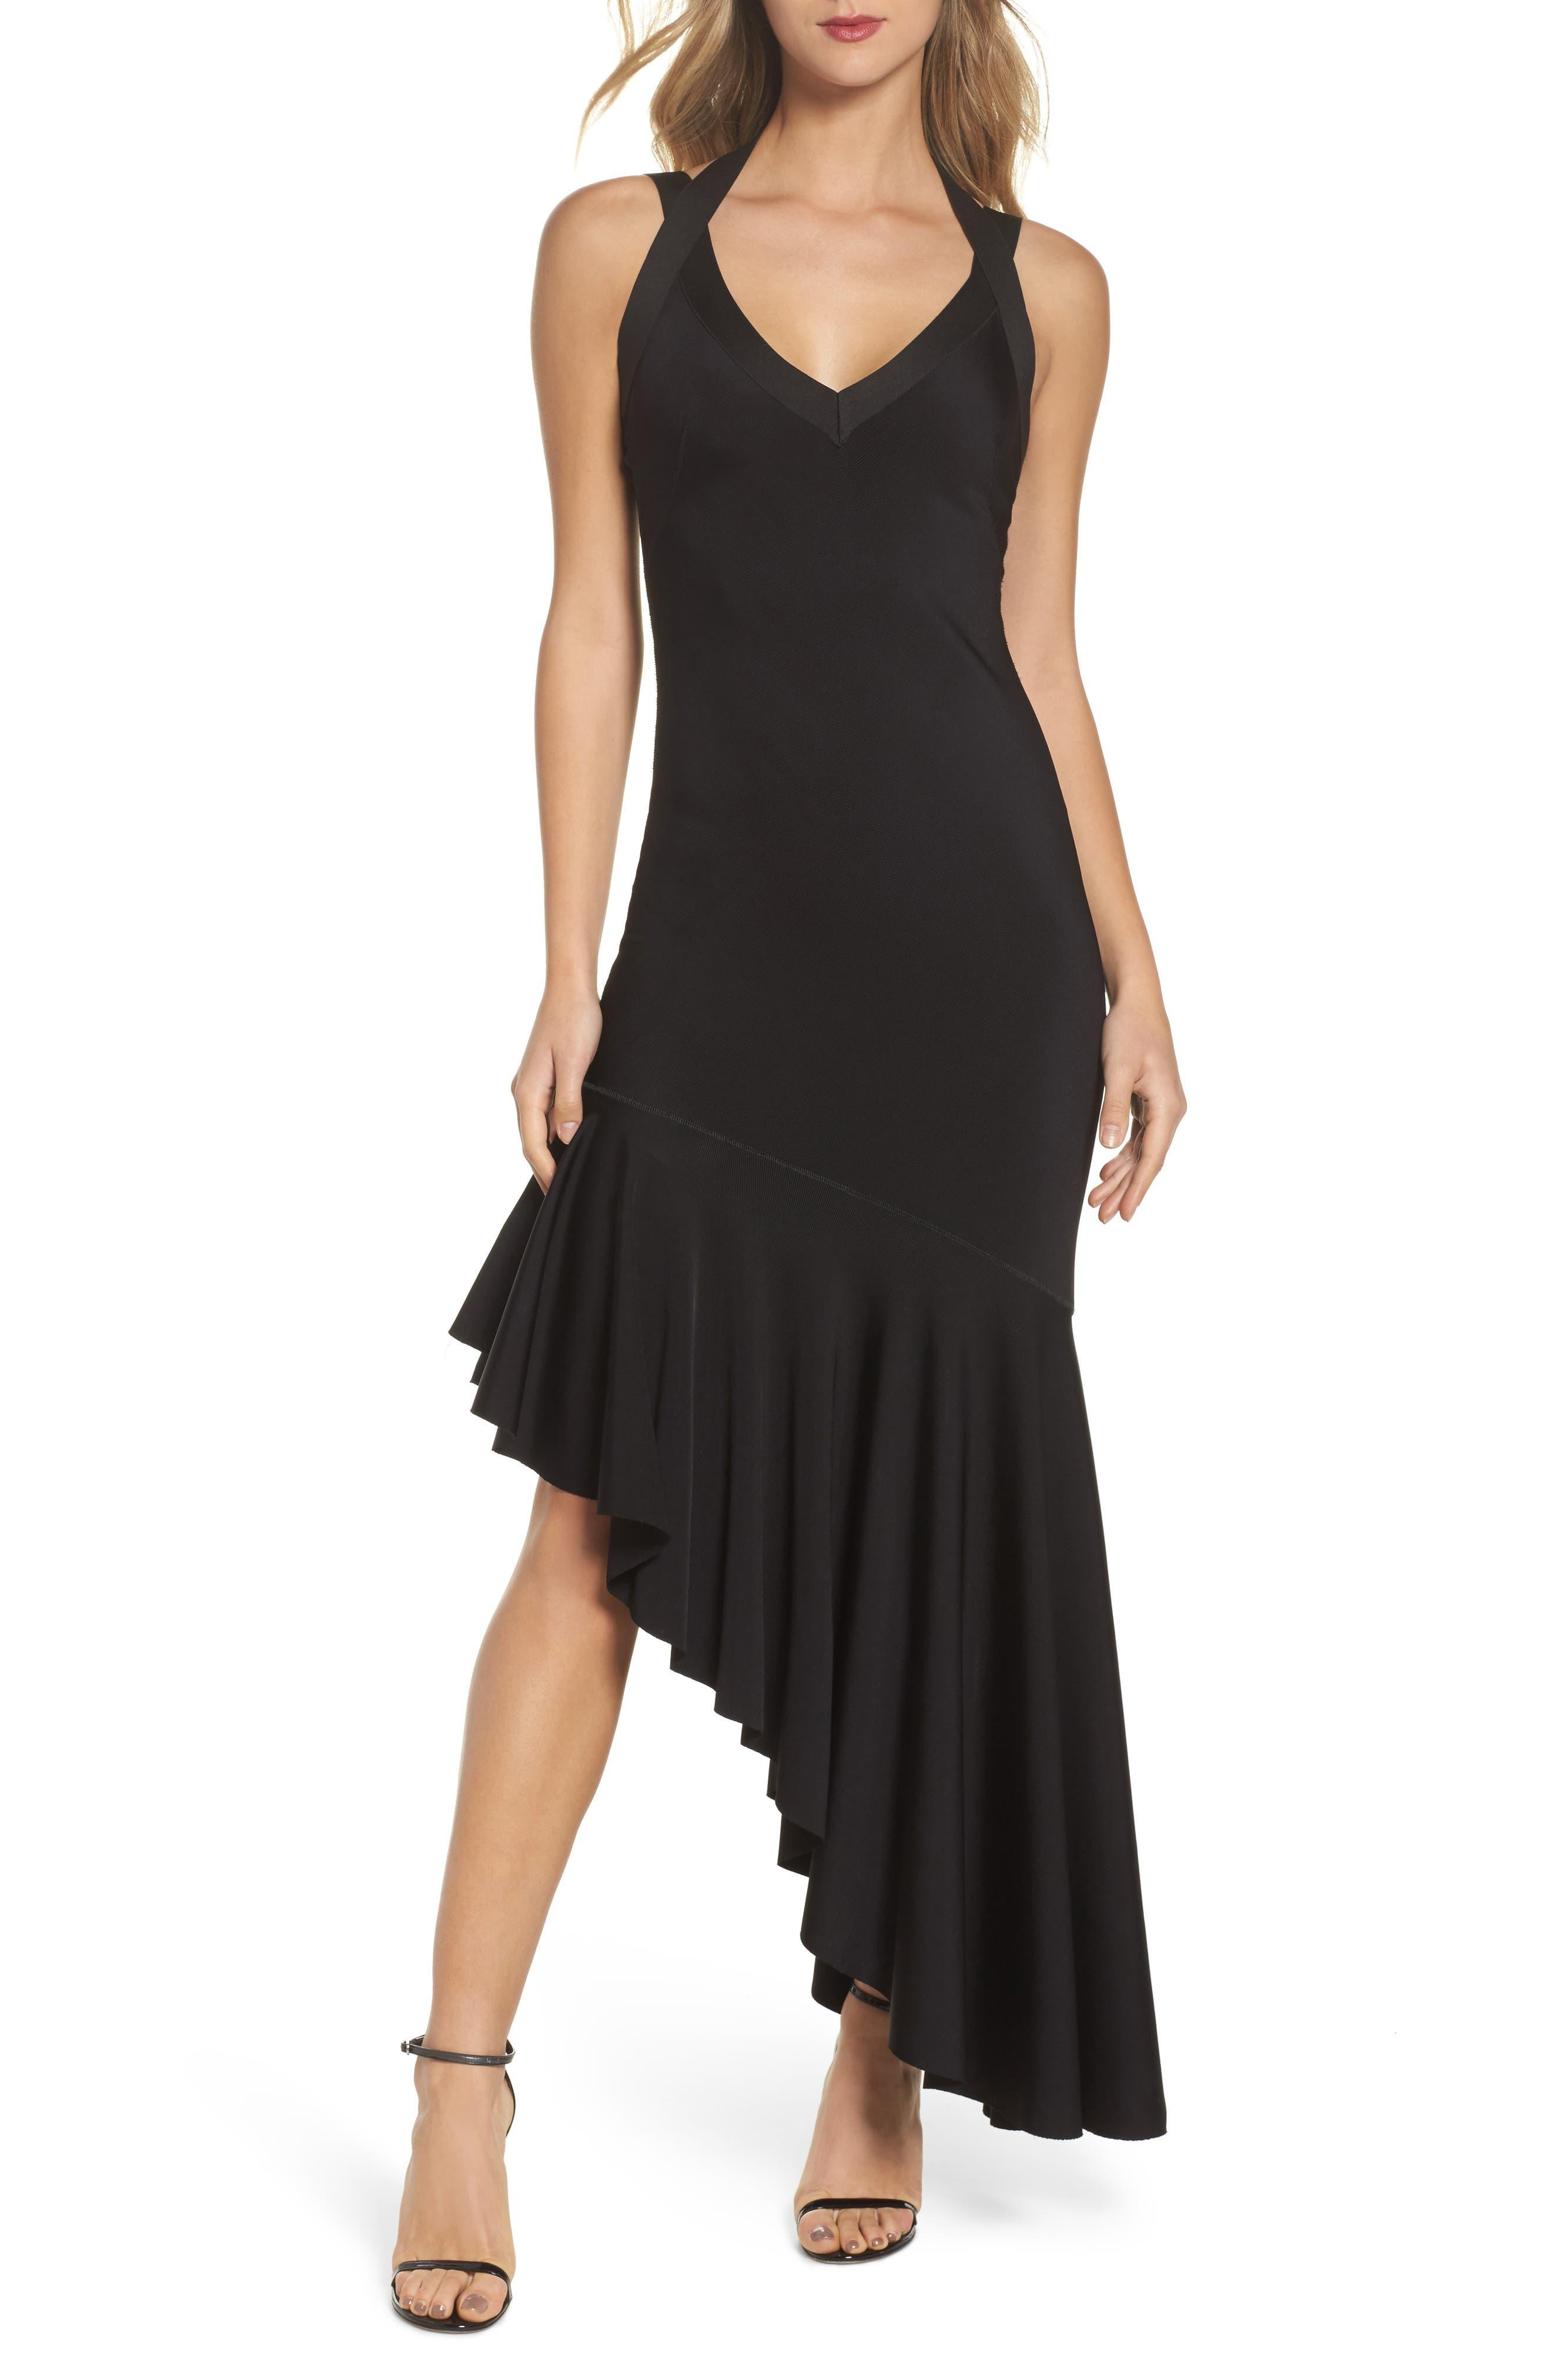 Main Image - Maria Bianca Nero Tara High/Low Knit Dress